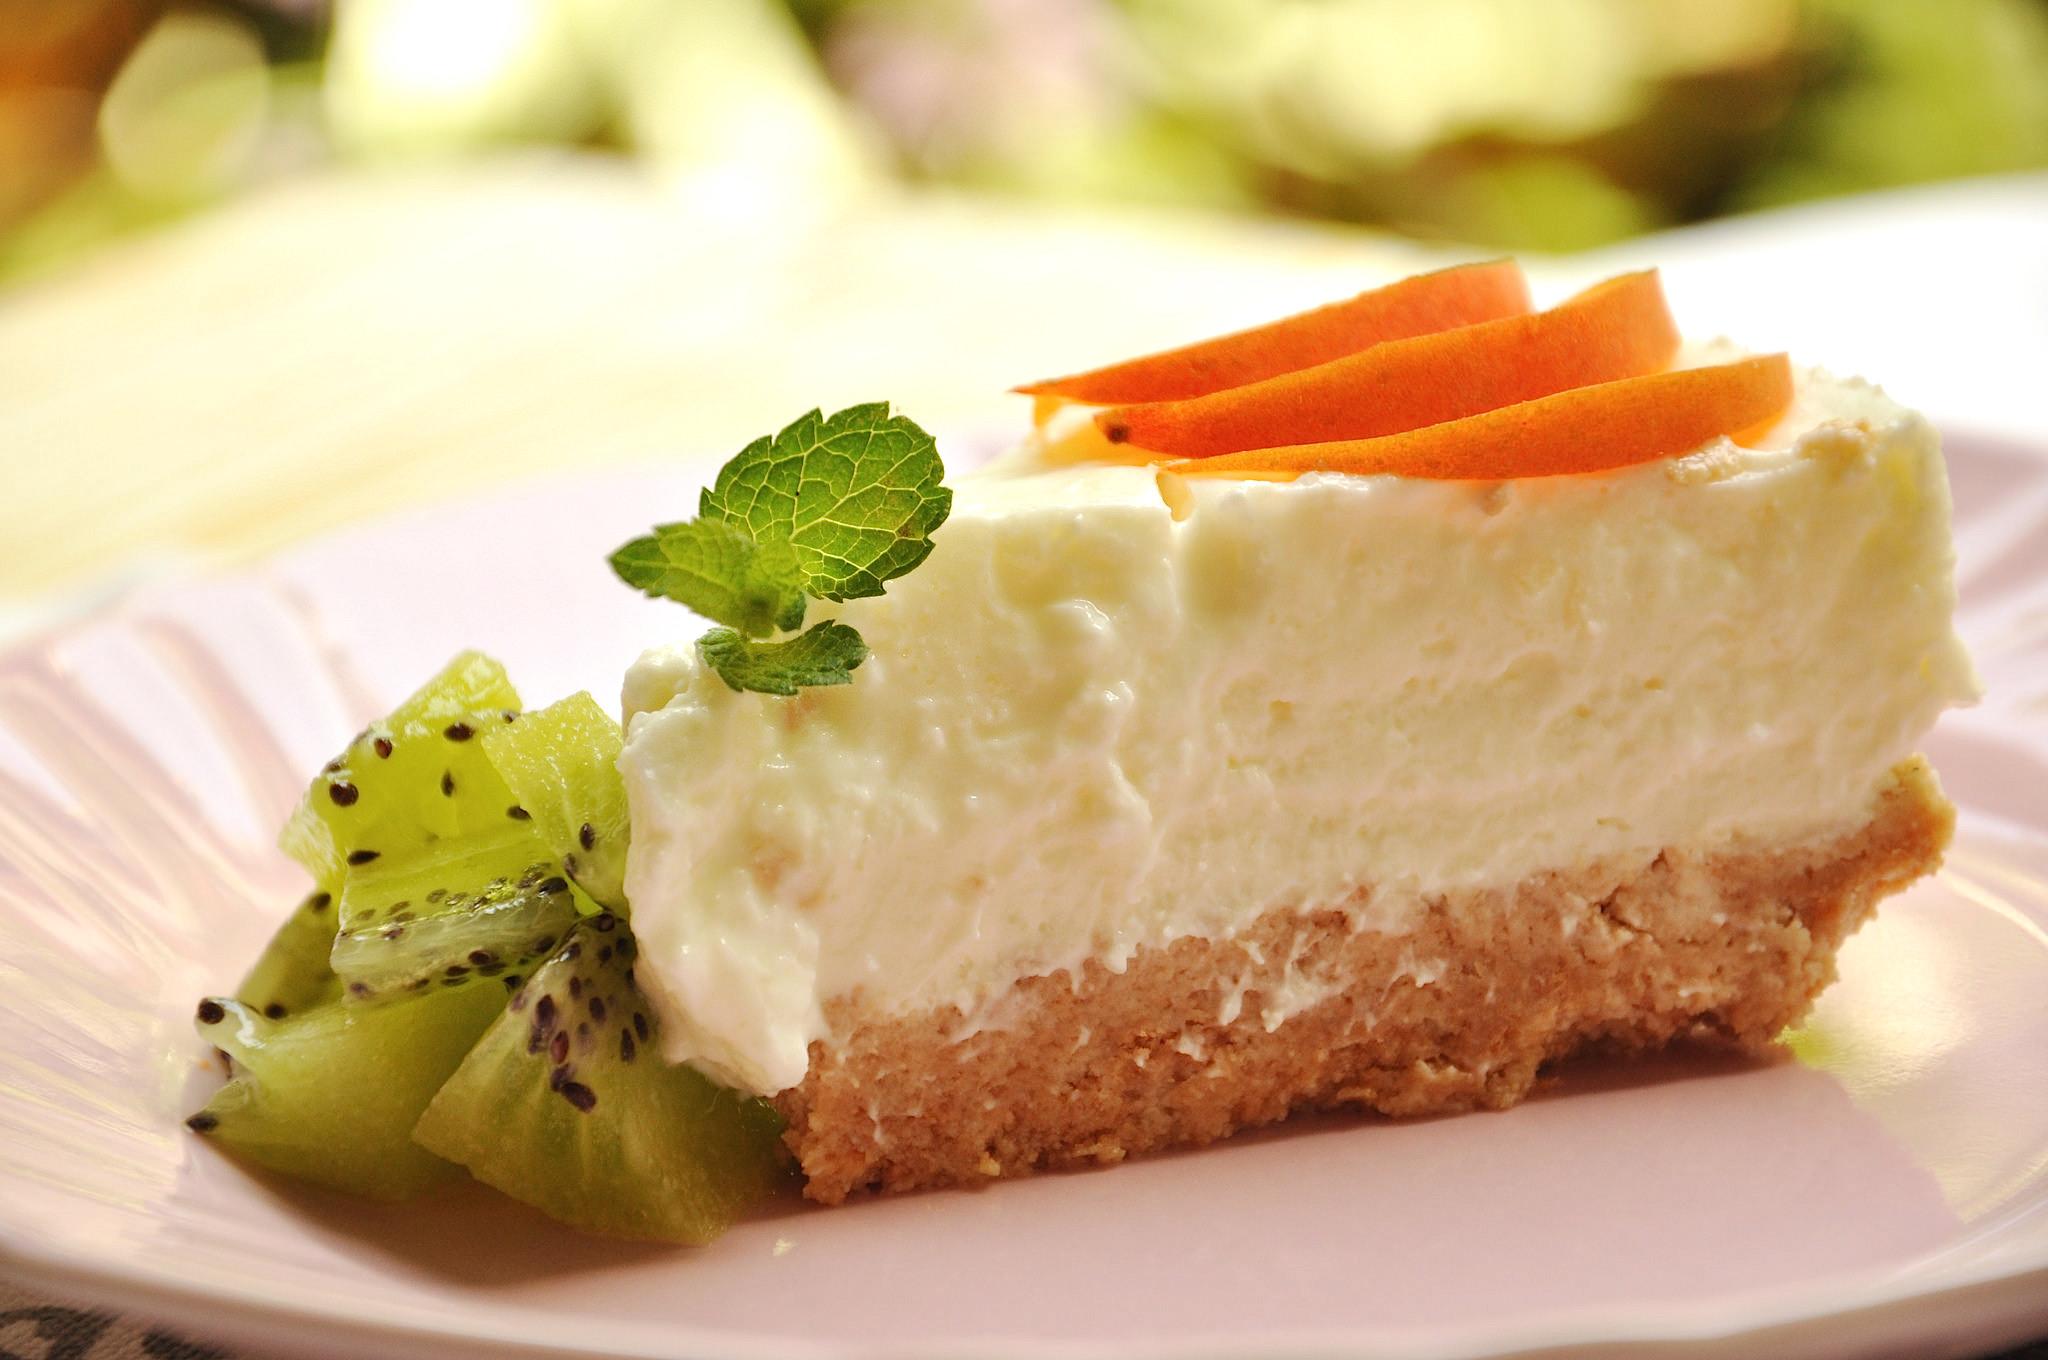 Torta fredda allo yogurt bimby tm31 tm5 for Ricette bimby torte